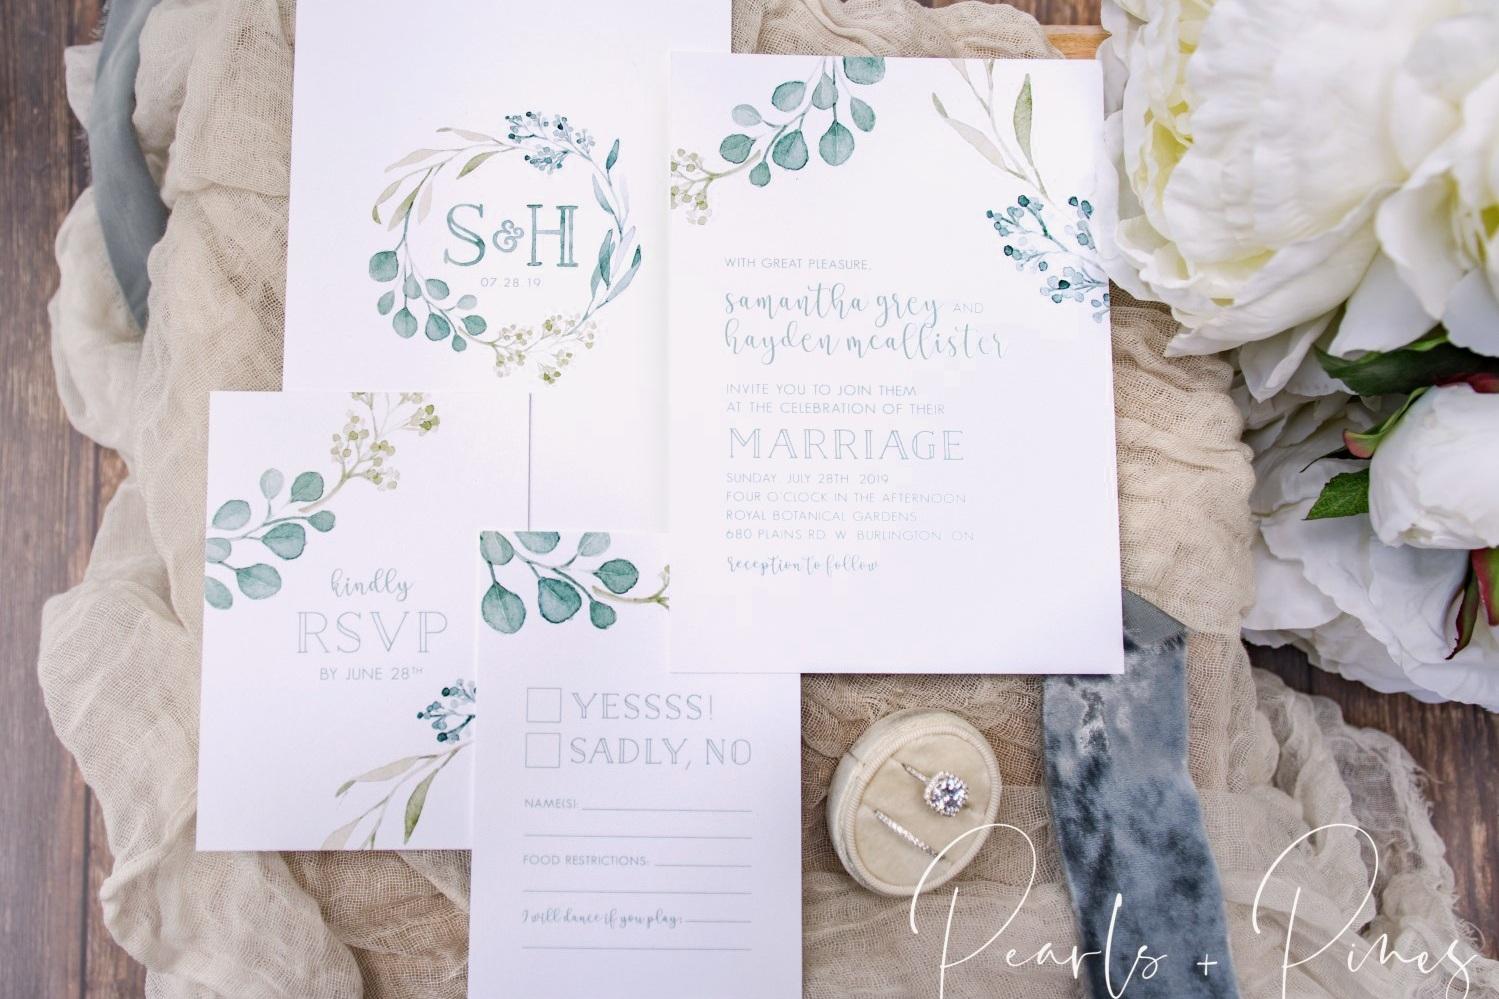 Crest Camryn Watercolor Monogram Wreath Personalized Wedding Suite PRINTED Monogram Greenery Wedding Invitation Greenery Crest